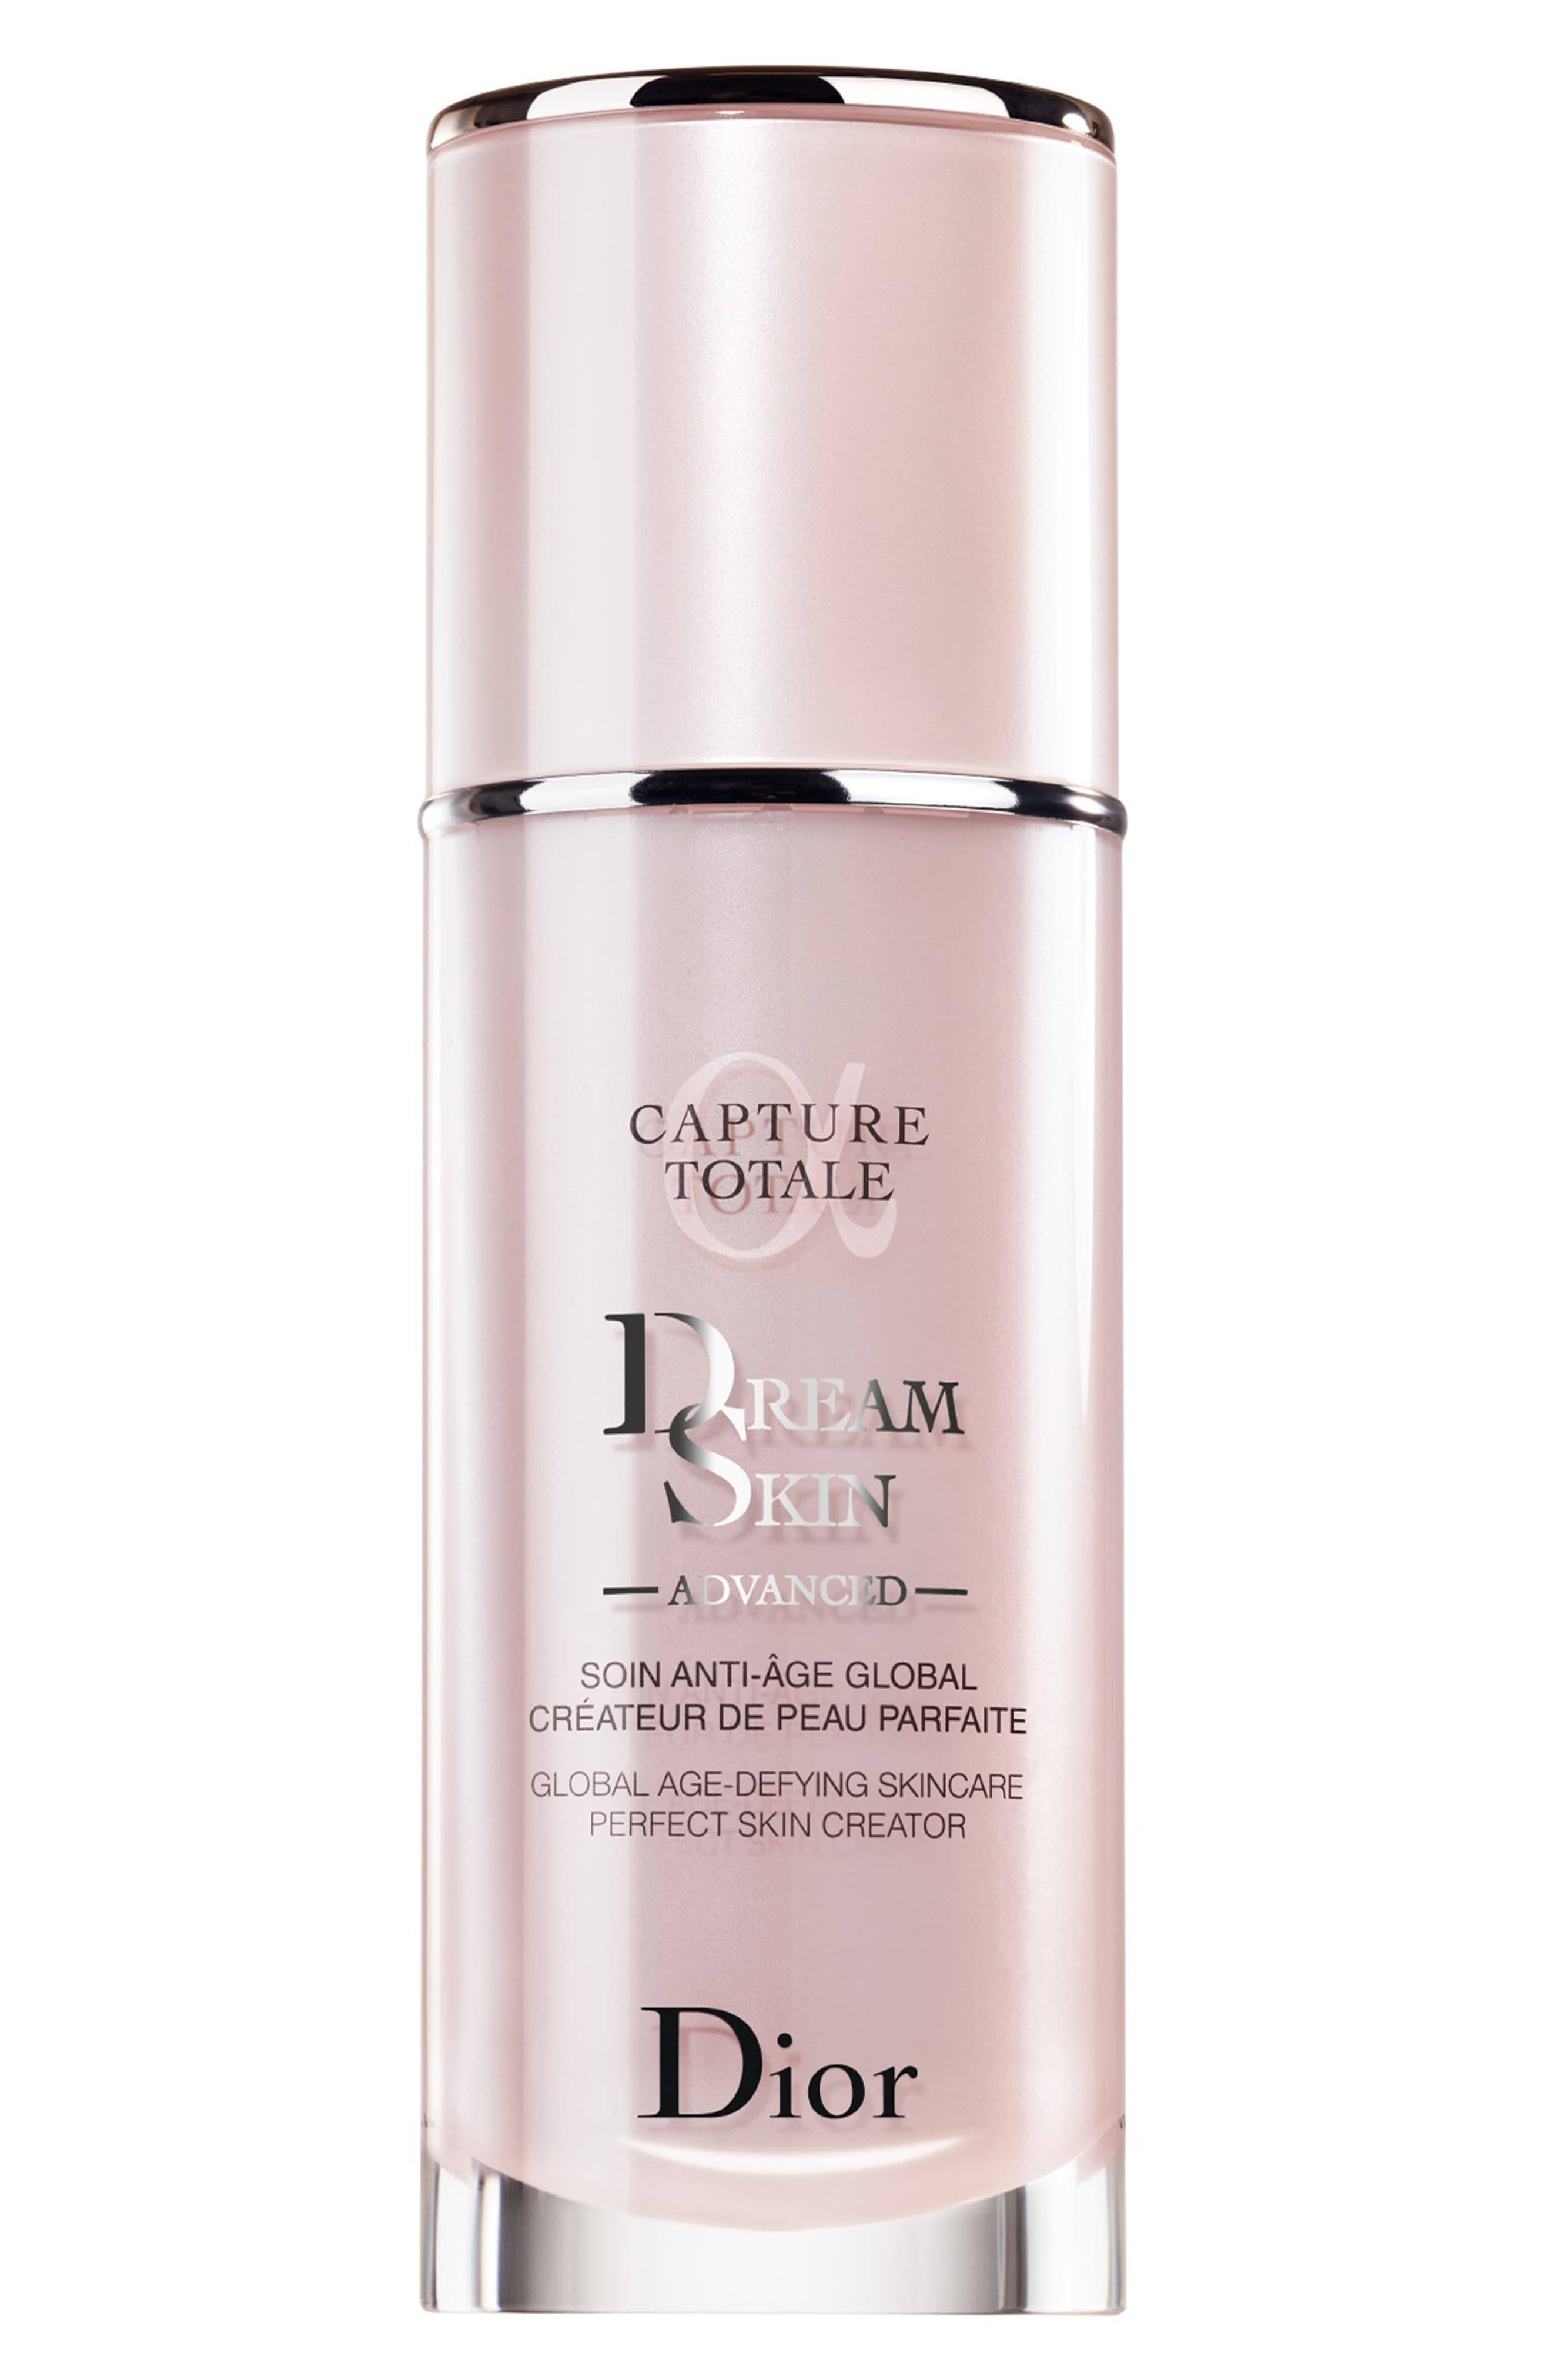 Capture Dreamskin Care Perfect Dior Sephora Dior Capture Totale Even Out Skin Tone Sephora